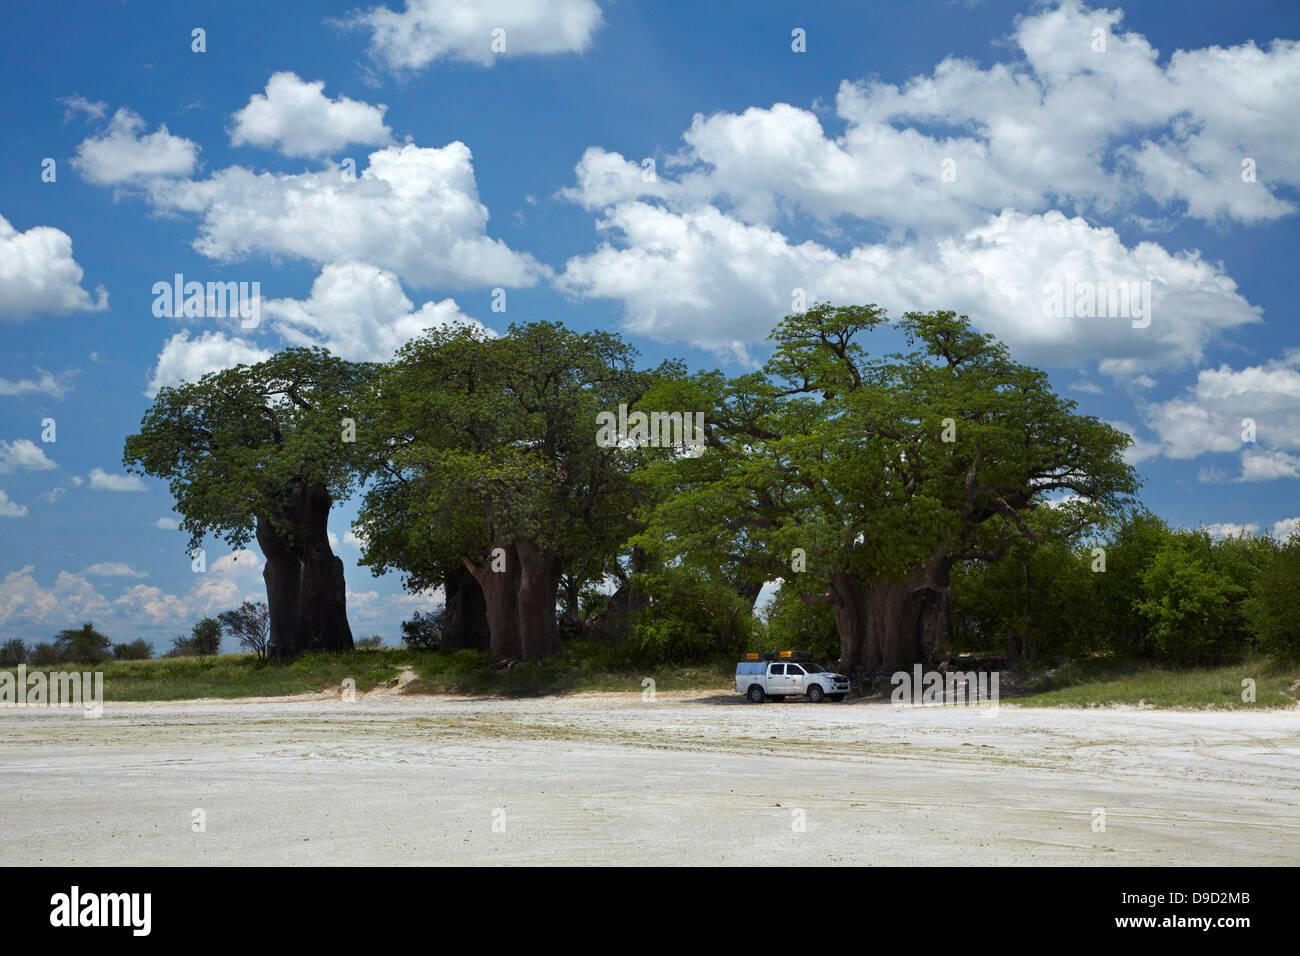 Baines' Baobabs and 4x4 camper, Kudiakam Pan, Nxai Pan National Park, Botswana, Africa - Stock Image